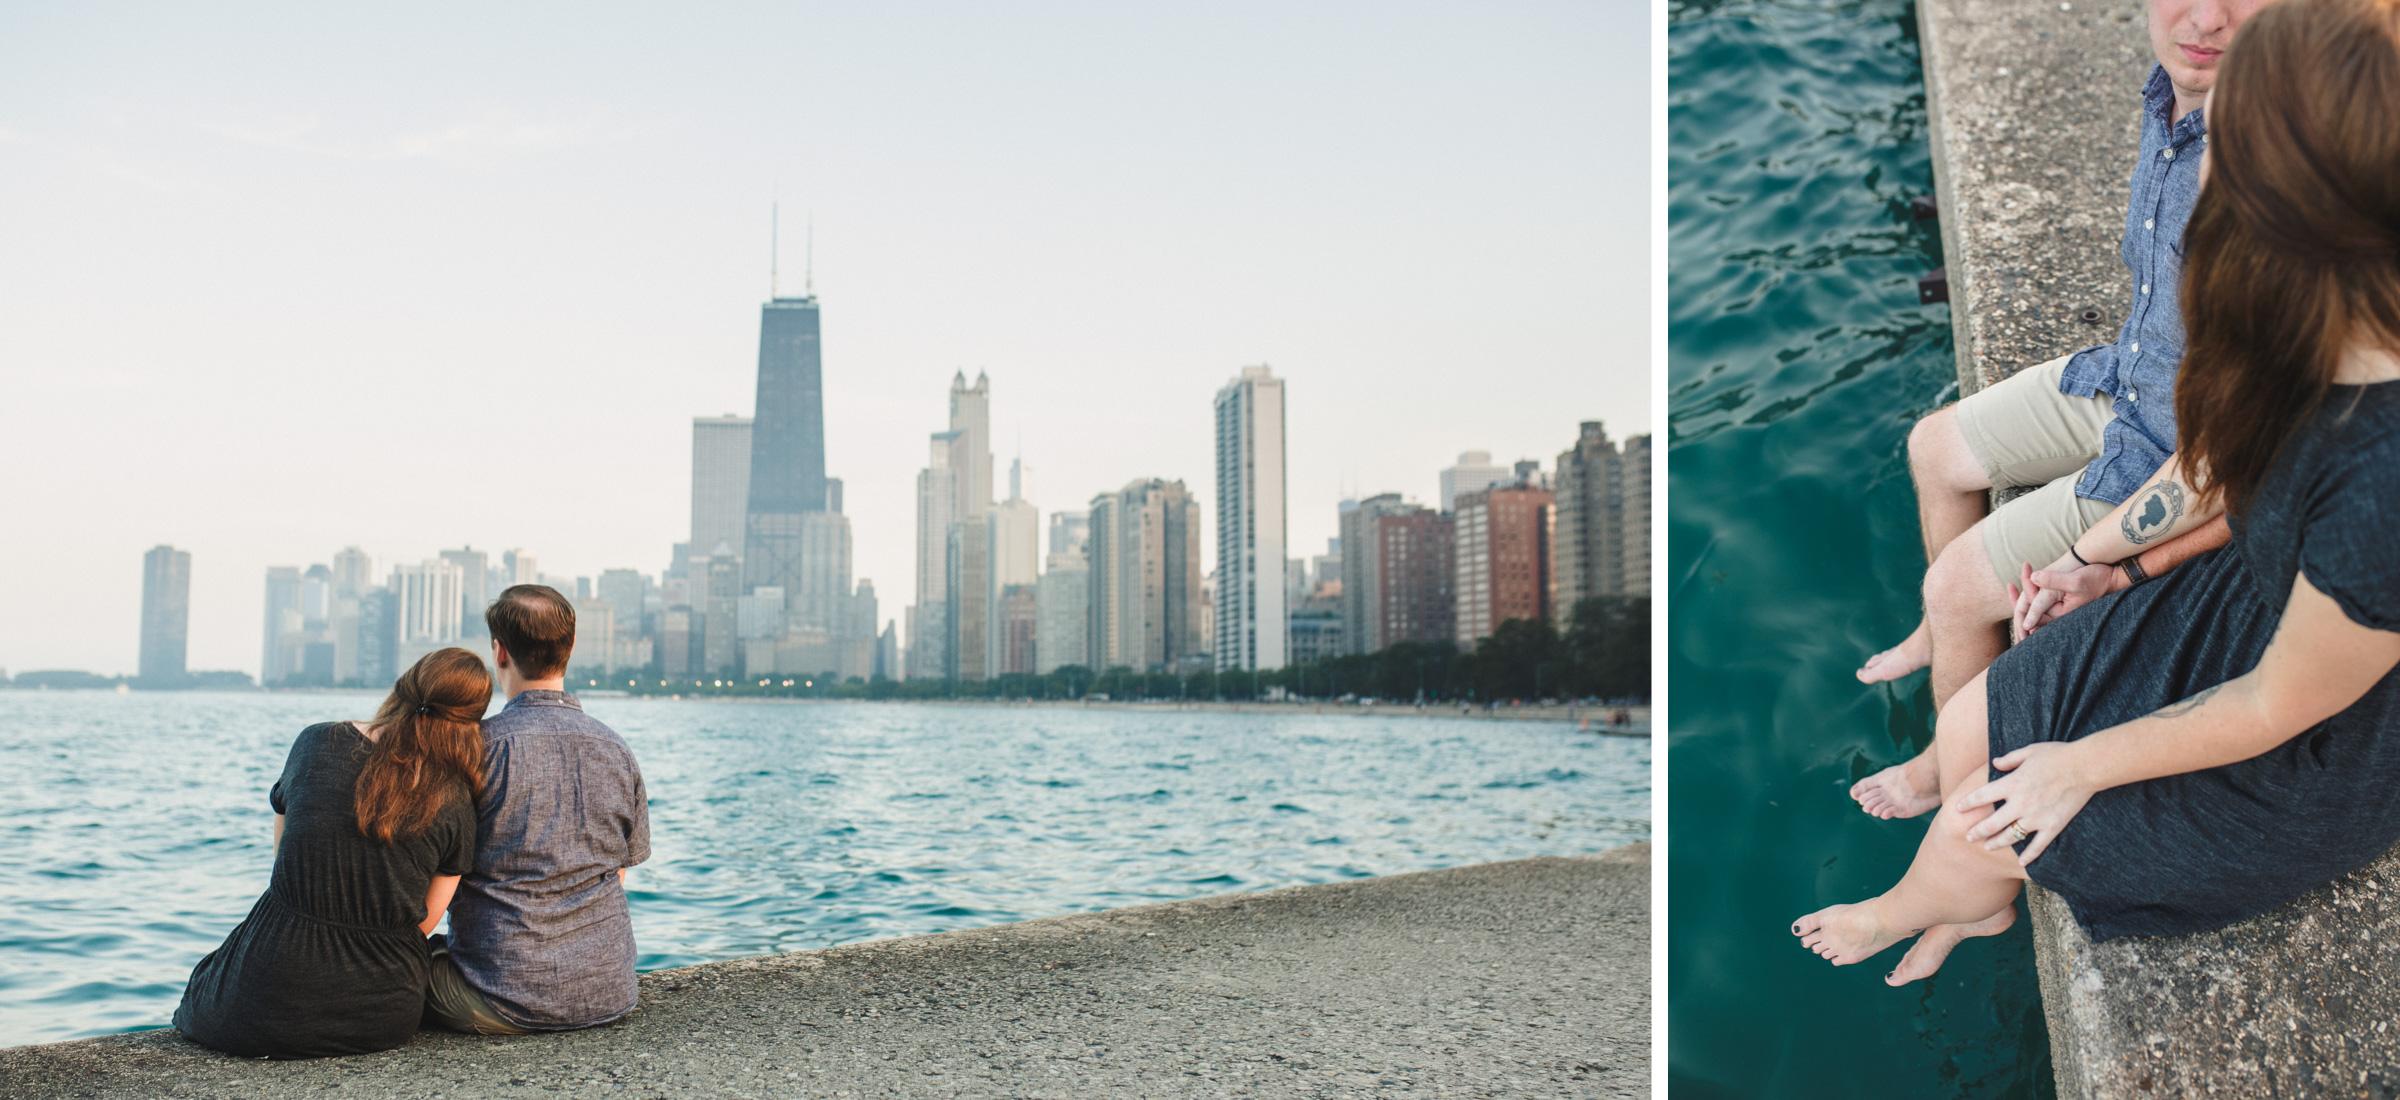 Chicago_The_Bean_Photographer_Kelsey_Diane_Photography_Destination_Wedding_Photographer_Lake_Michigan_Illnois_Wedding_Photographer_5.jpg